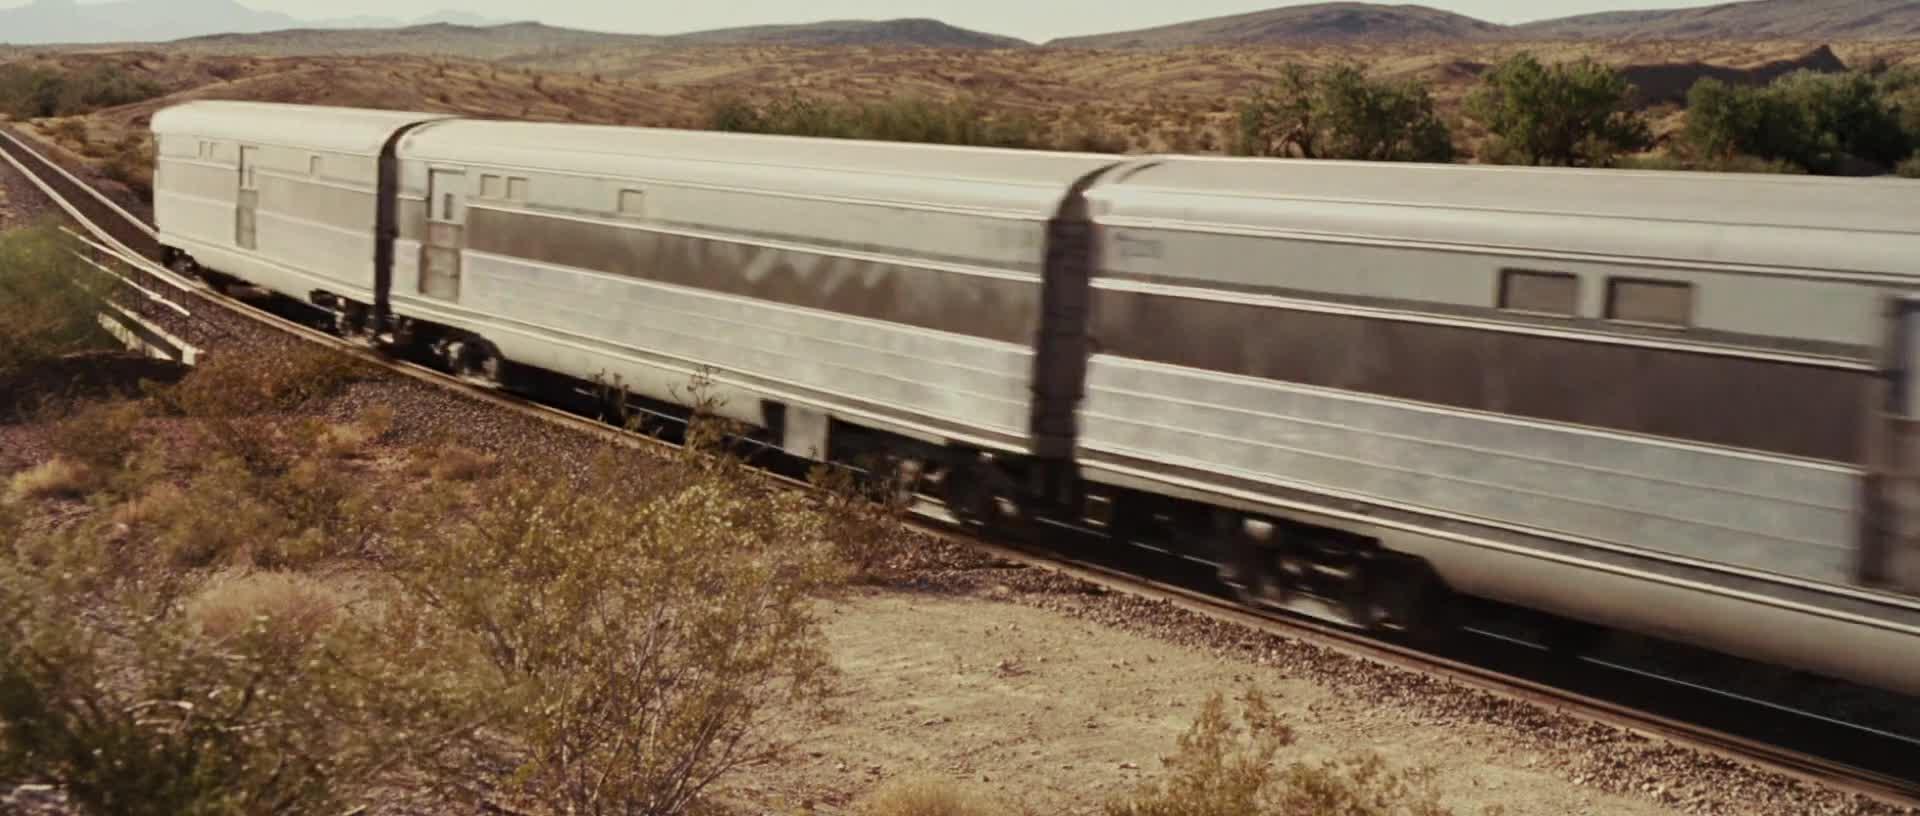 Fast & Furious 5 Rio Heist เร็ว...แรงทะลุนรก 5 (2011)